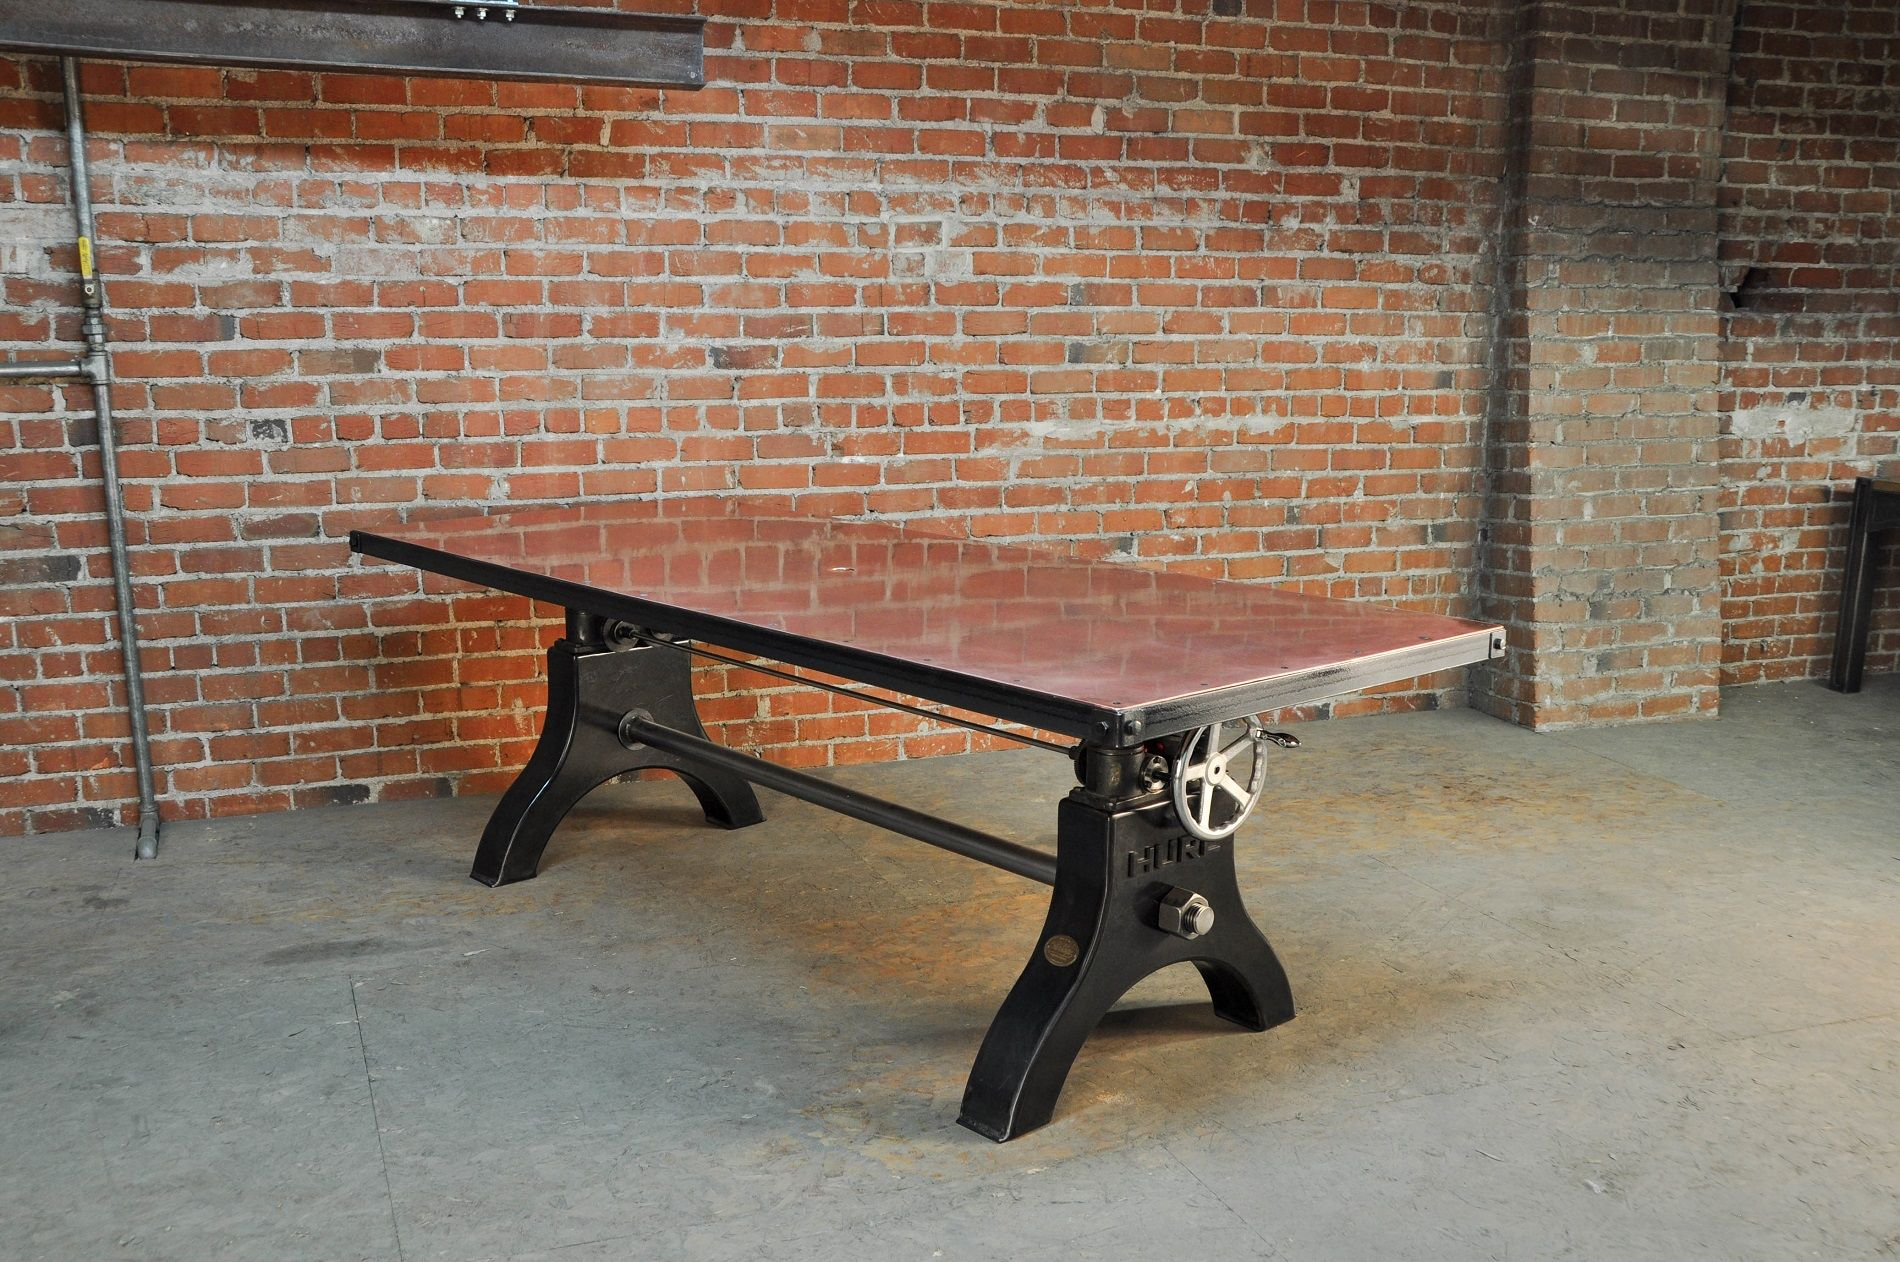 Hure crank table vintage industrial furniture - Copper Top Hure Crank Table Model Hu47 Vintage Industrial Furnitureindustrial